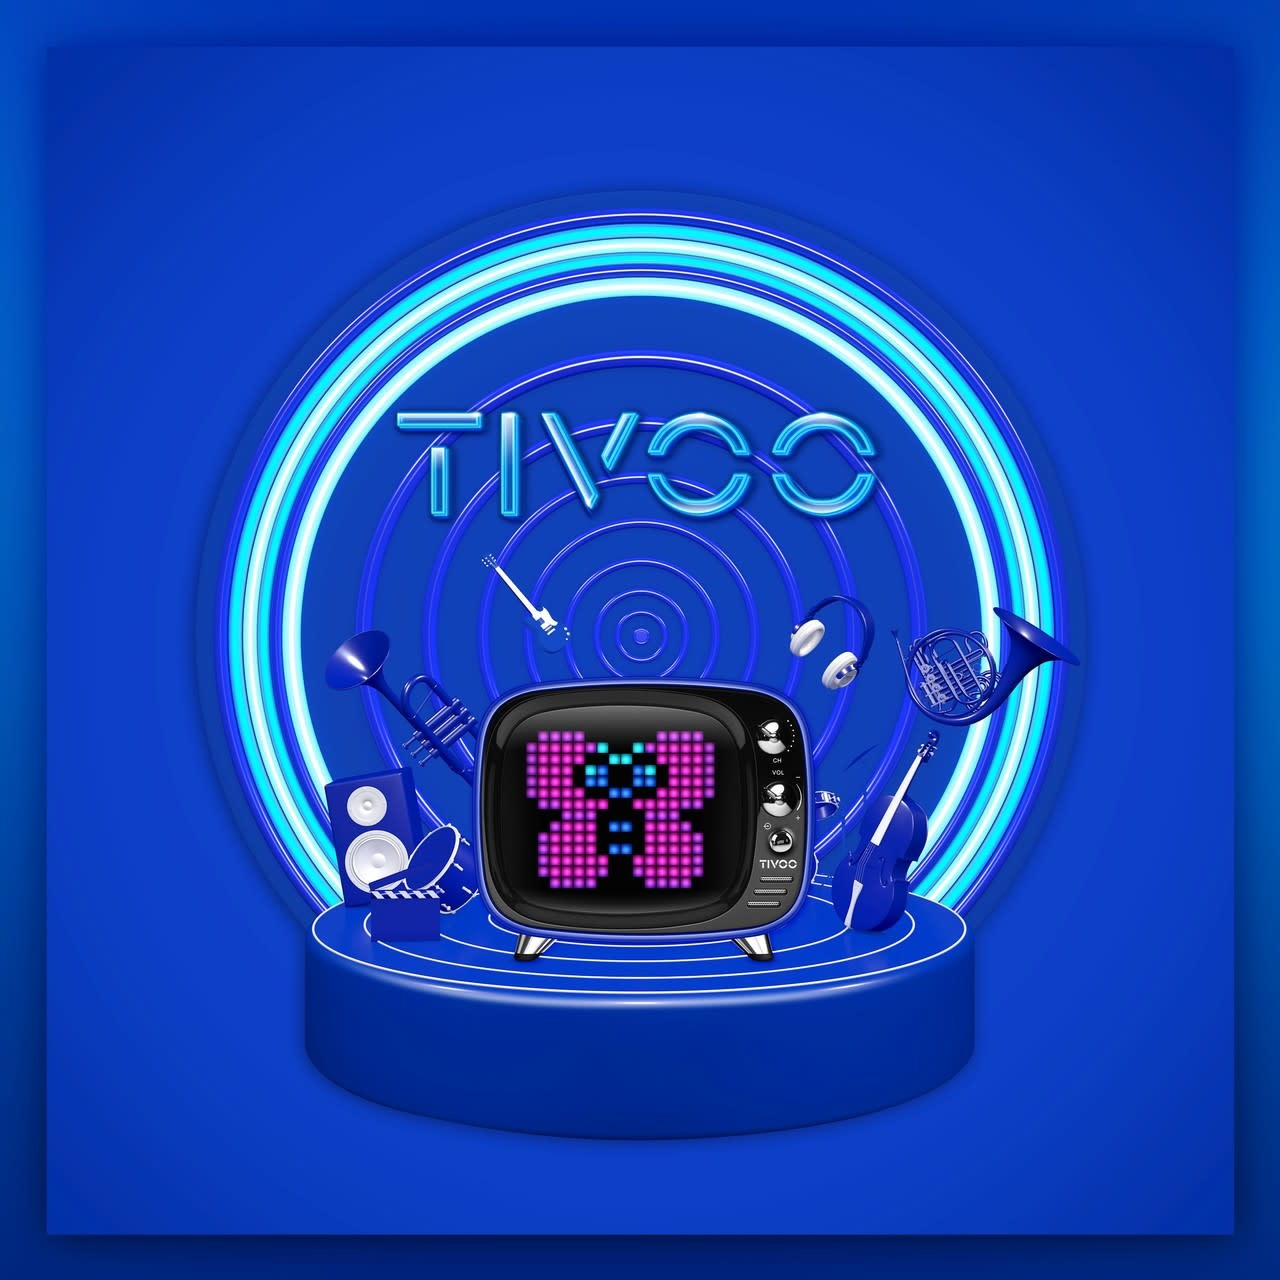 M24 TIVOO, BLUE-4